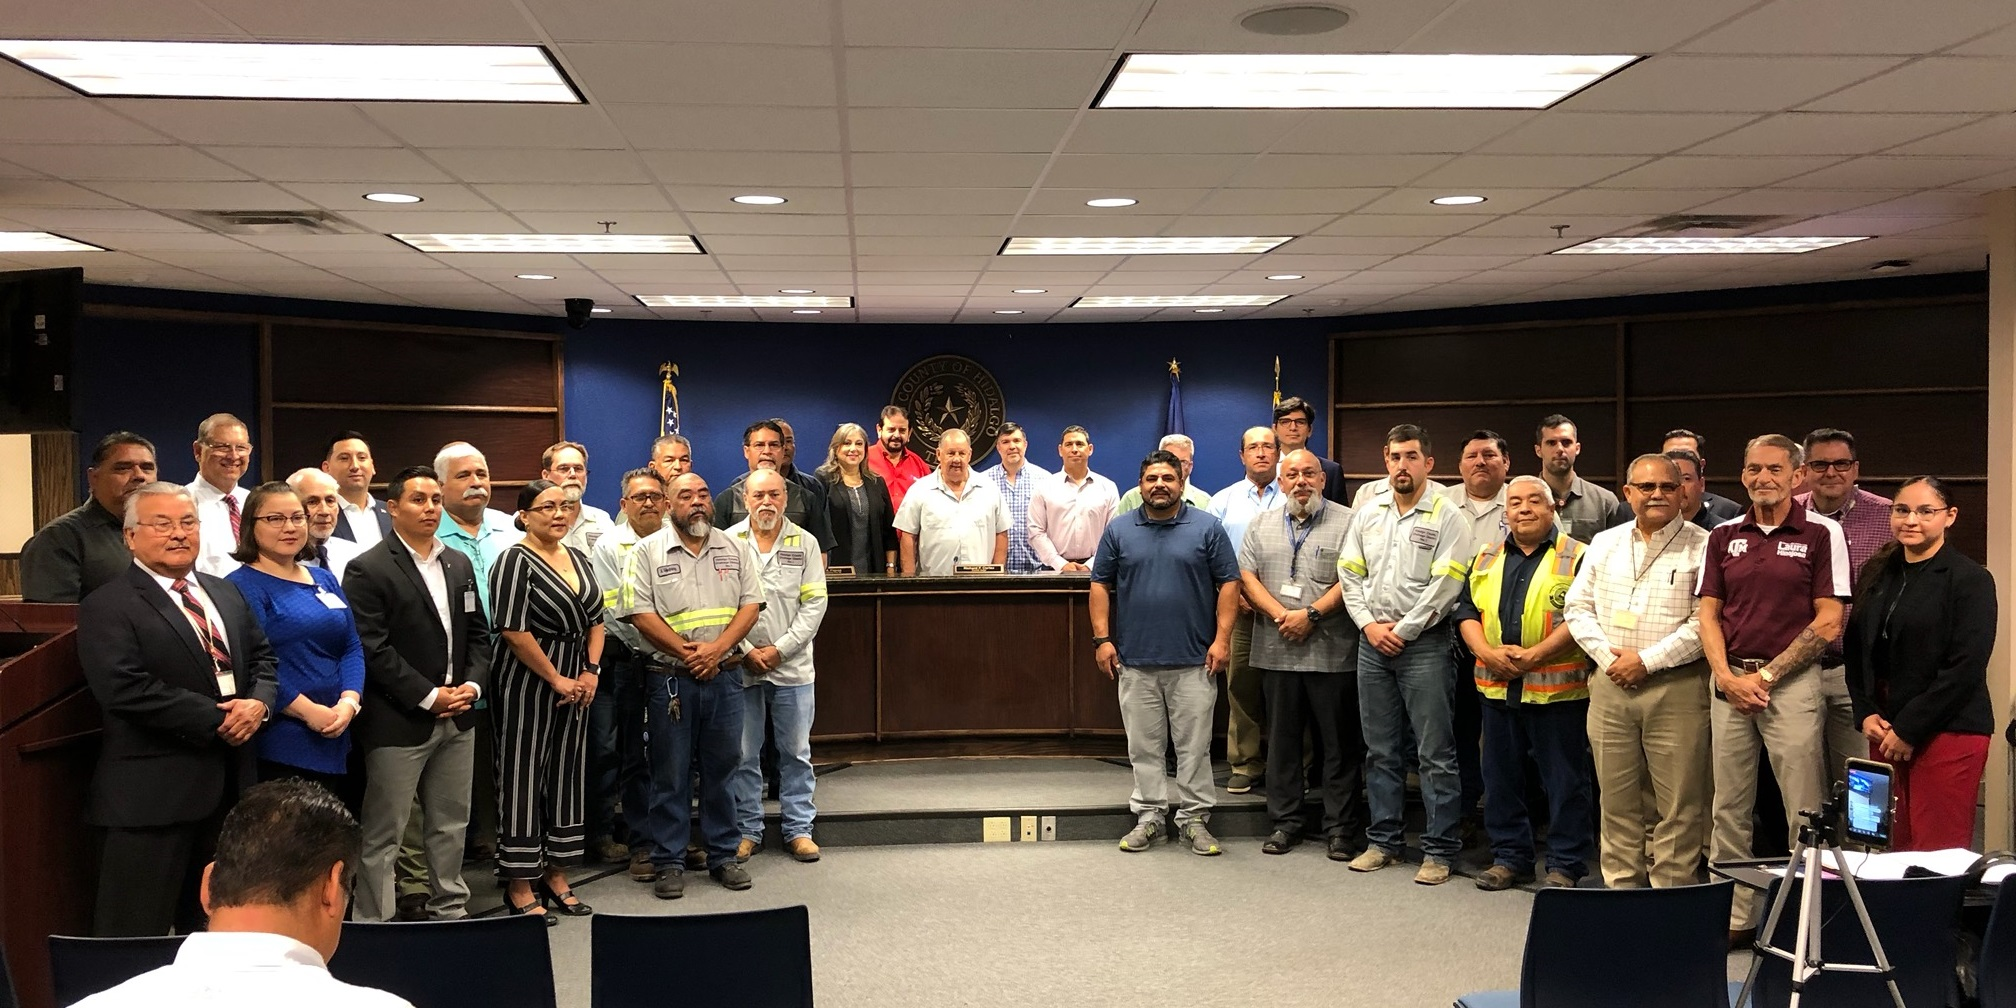 Hidalgo County Veterans